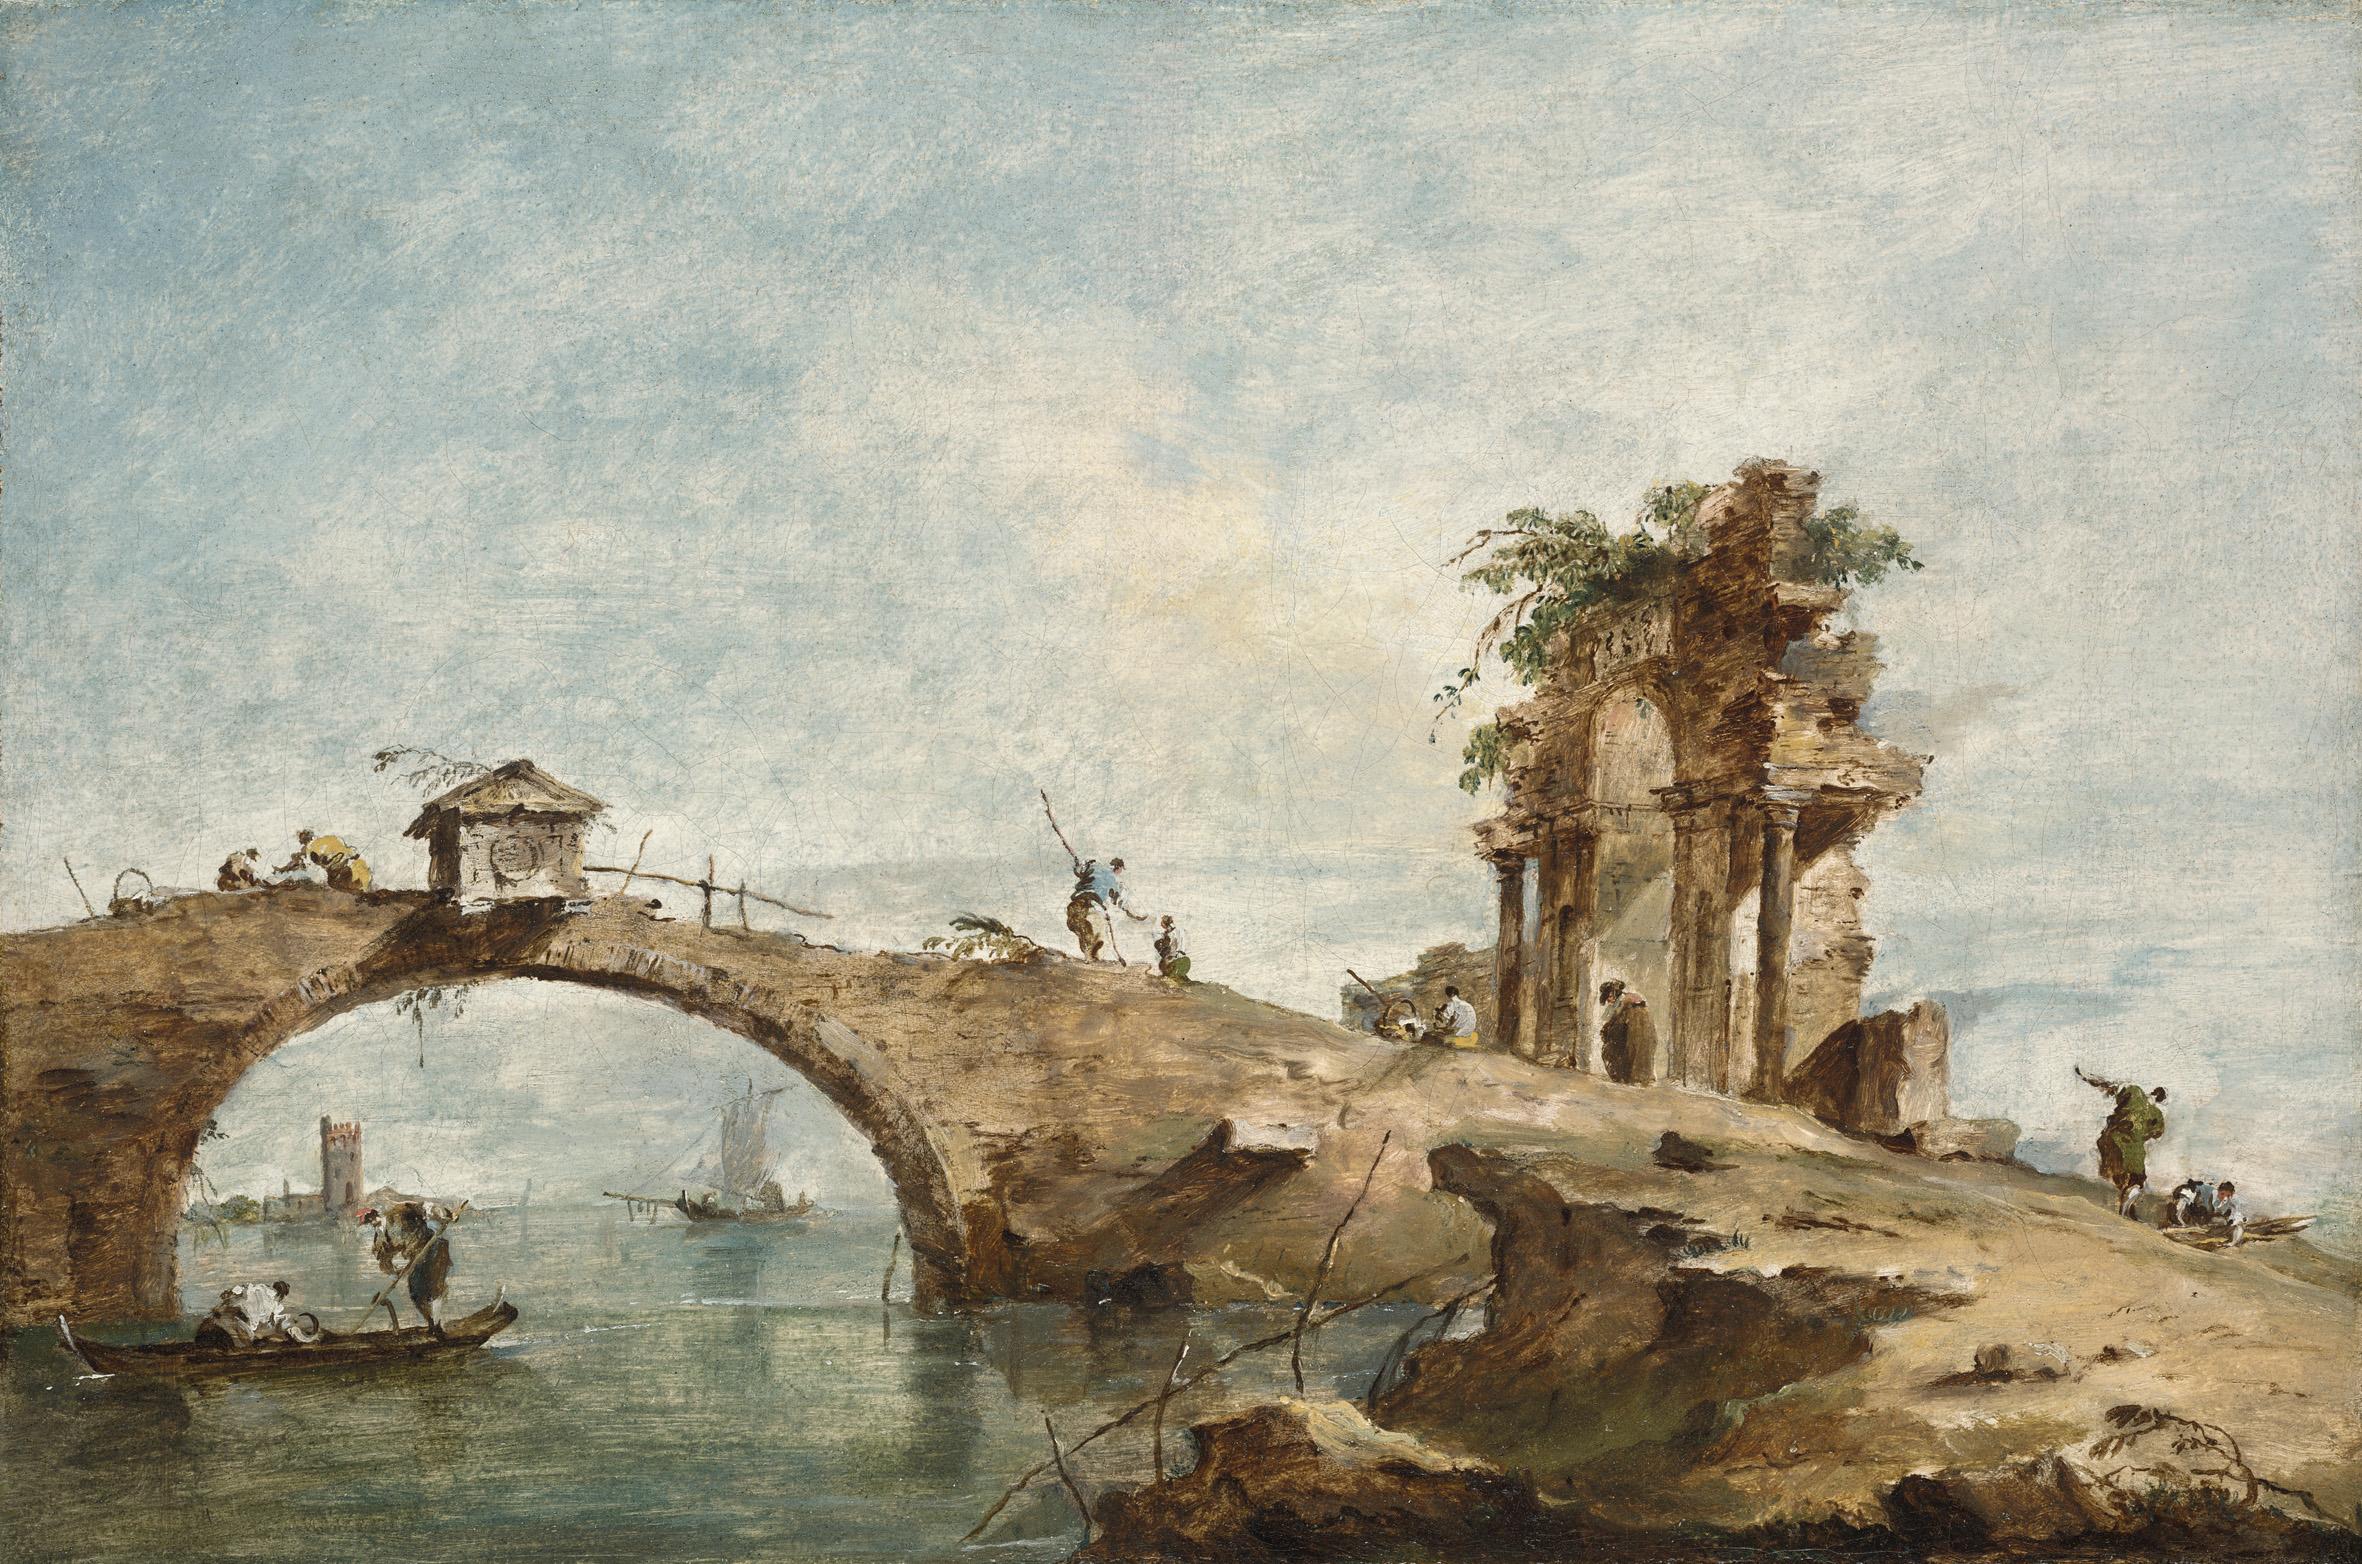 Francesco Guardi, Lagune capriccio met een brug, olieverf op canvas.